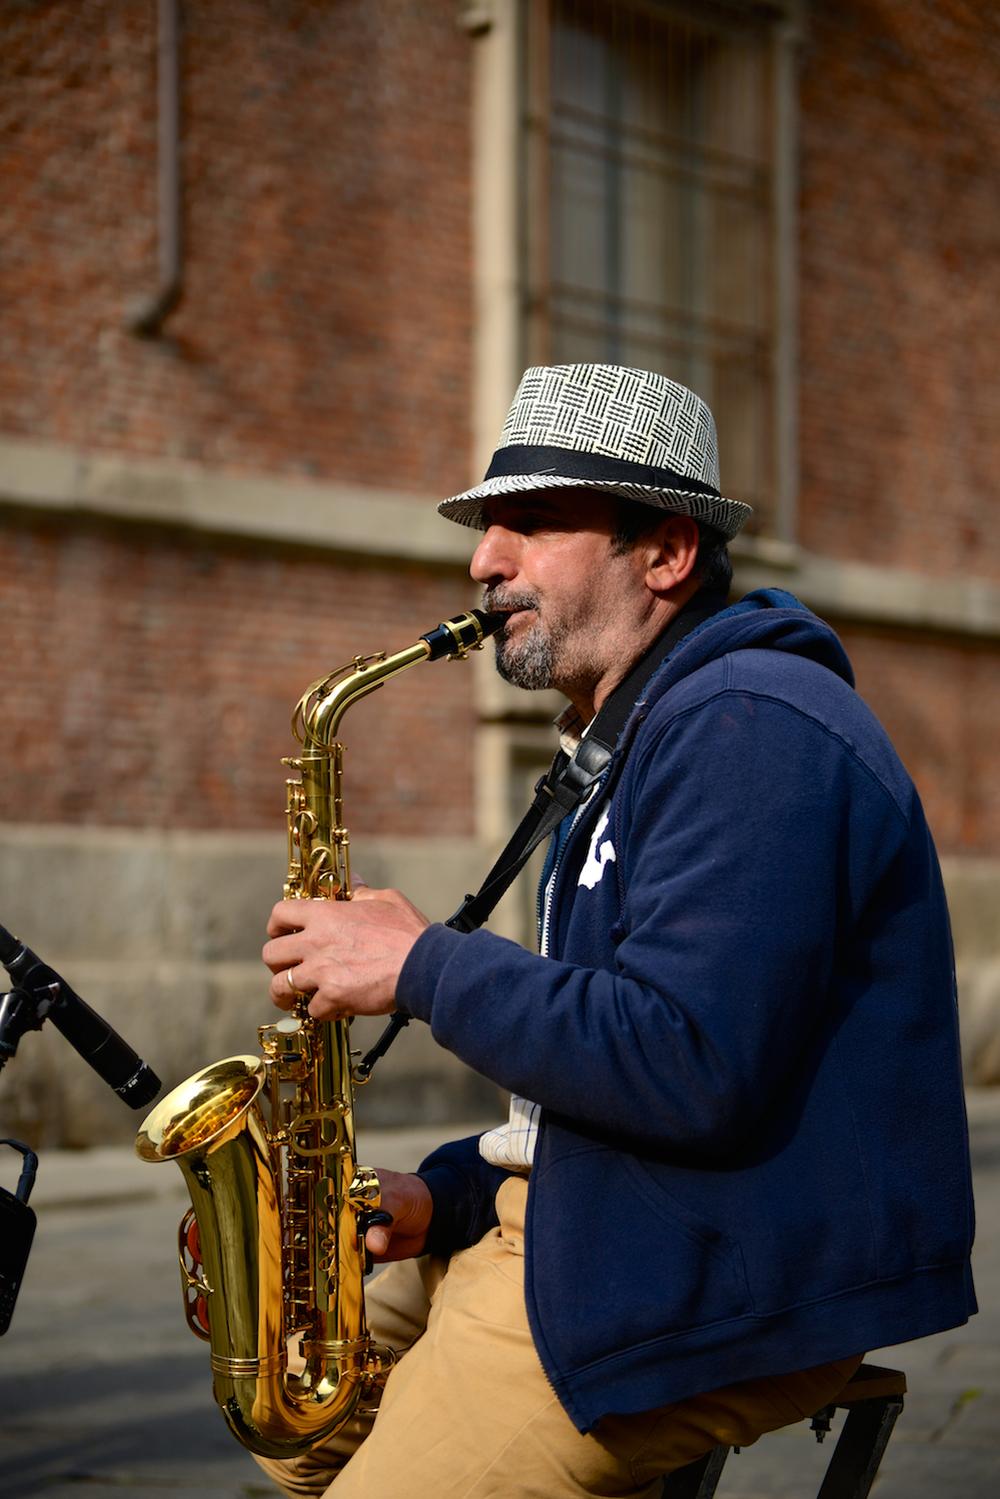 Brera Saxophonist 02.jpg